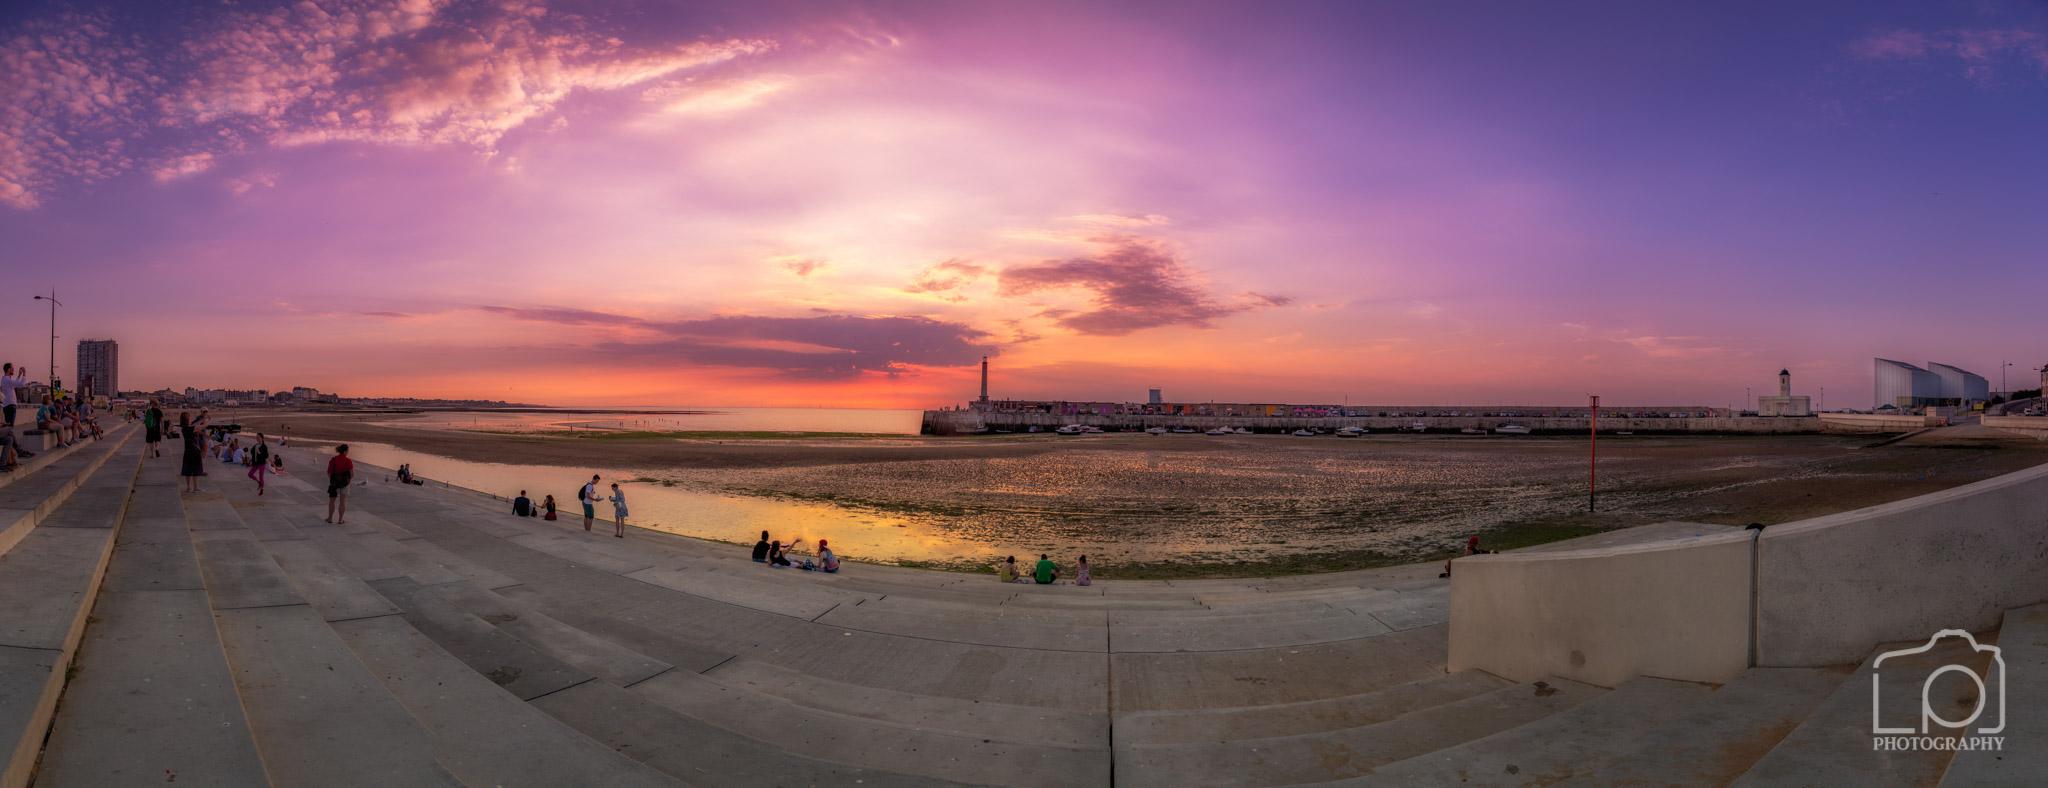 Margate Sunset Panorama